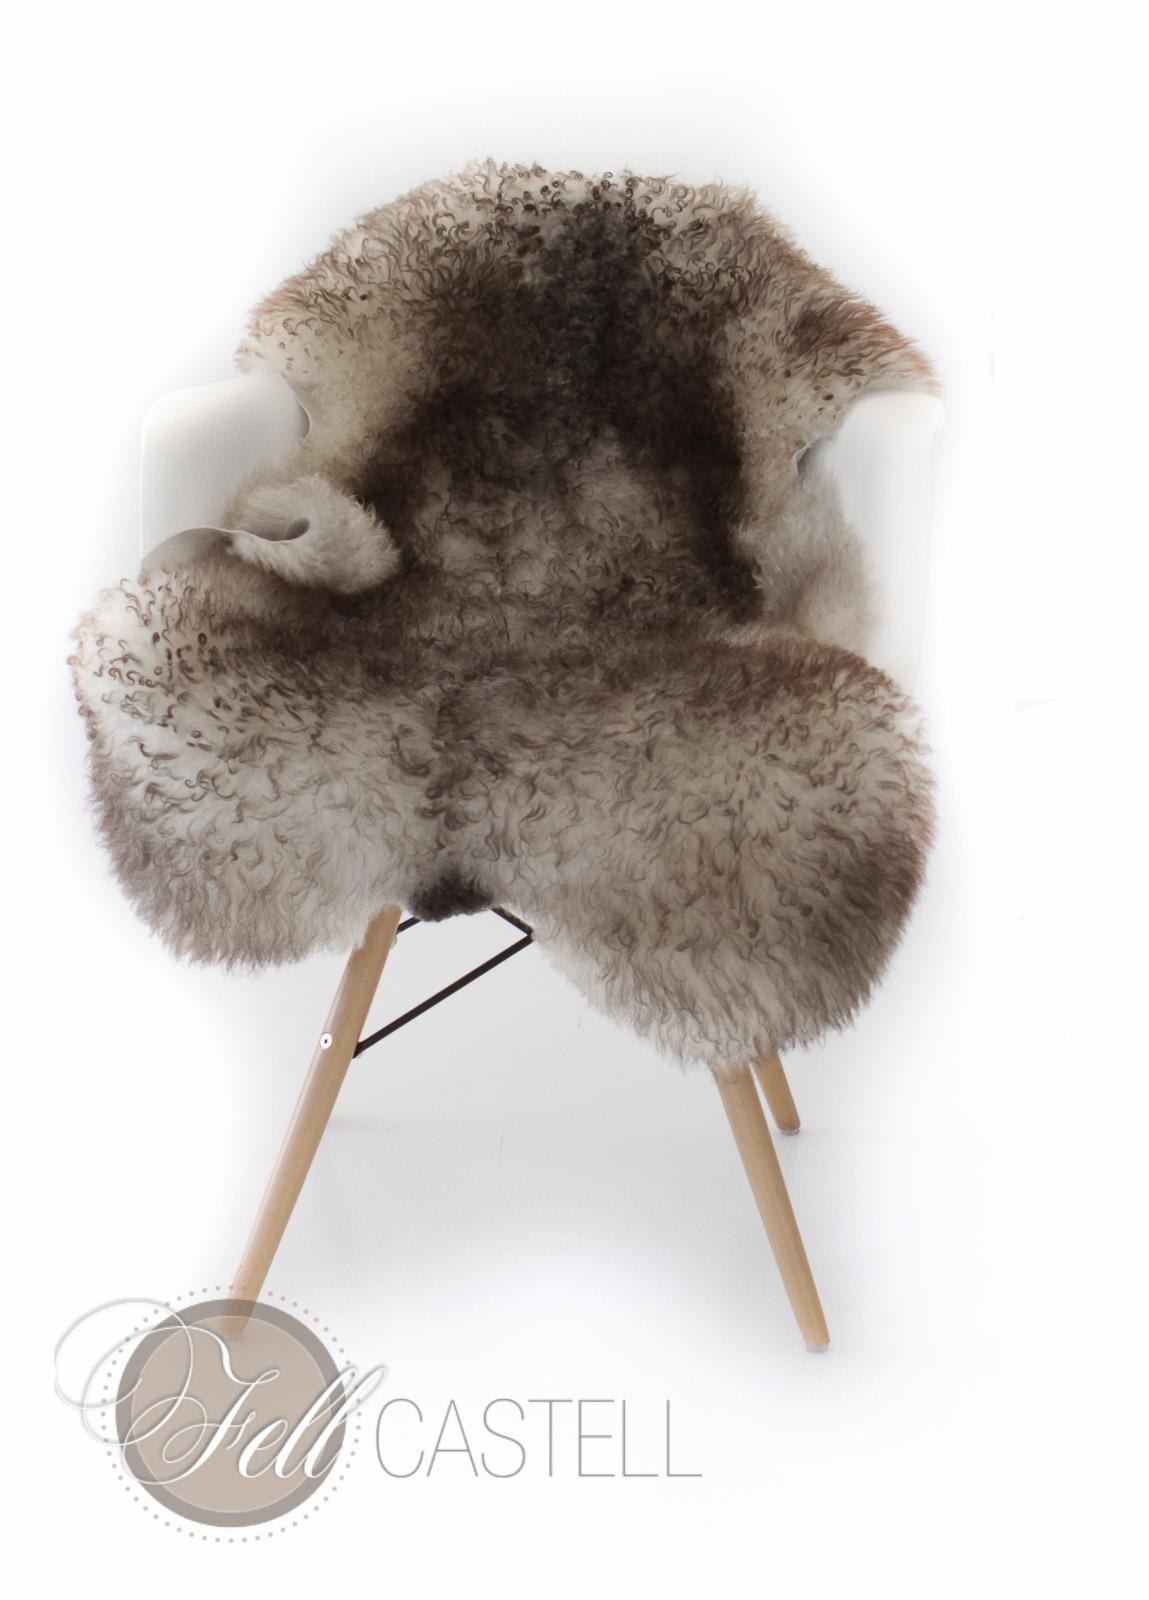 skandinavisches schaffell wei mit graubraunen spitzen ungef rbt 98 x 61 cm lammfell. Black Bedroom Furniture Sets. Home Design Ideas